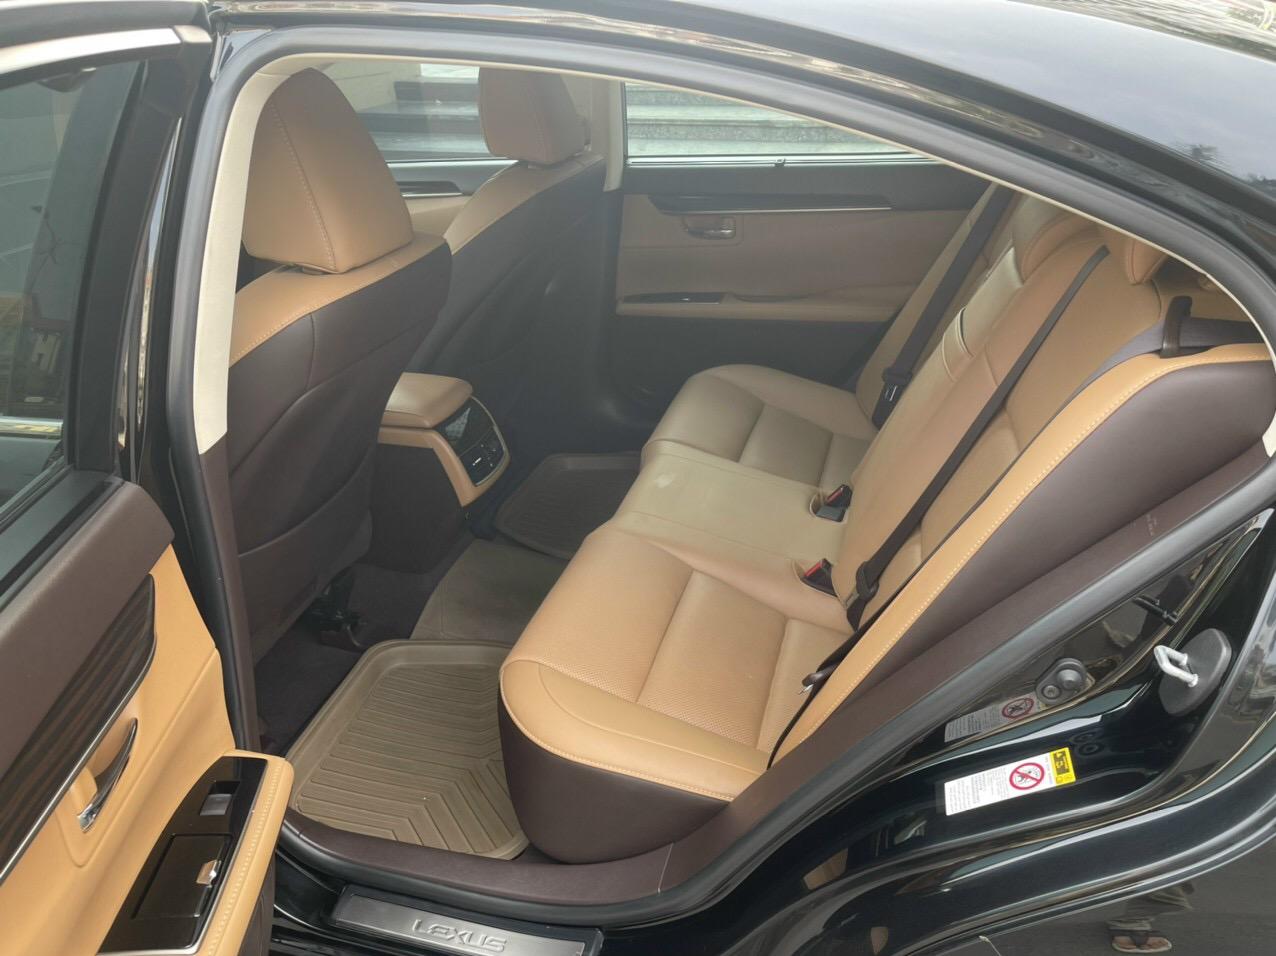 Bán Lexus ES250, sx 2016, màu đen, như mới.